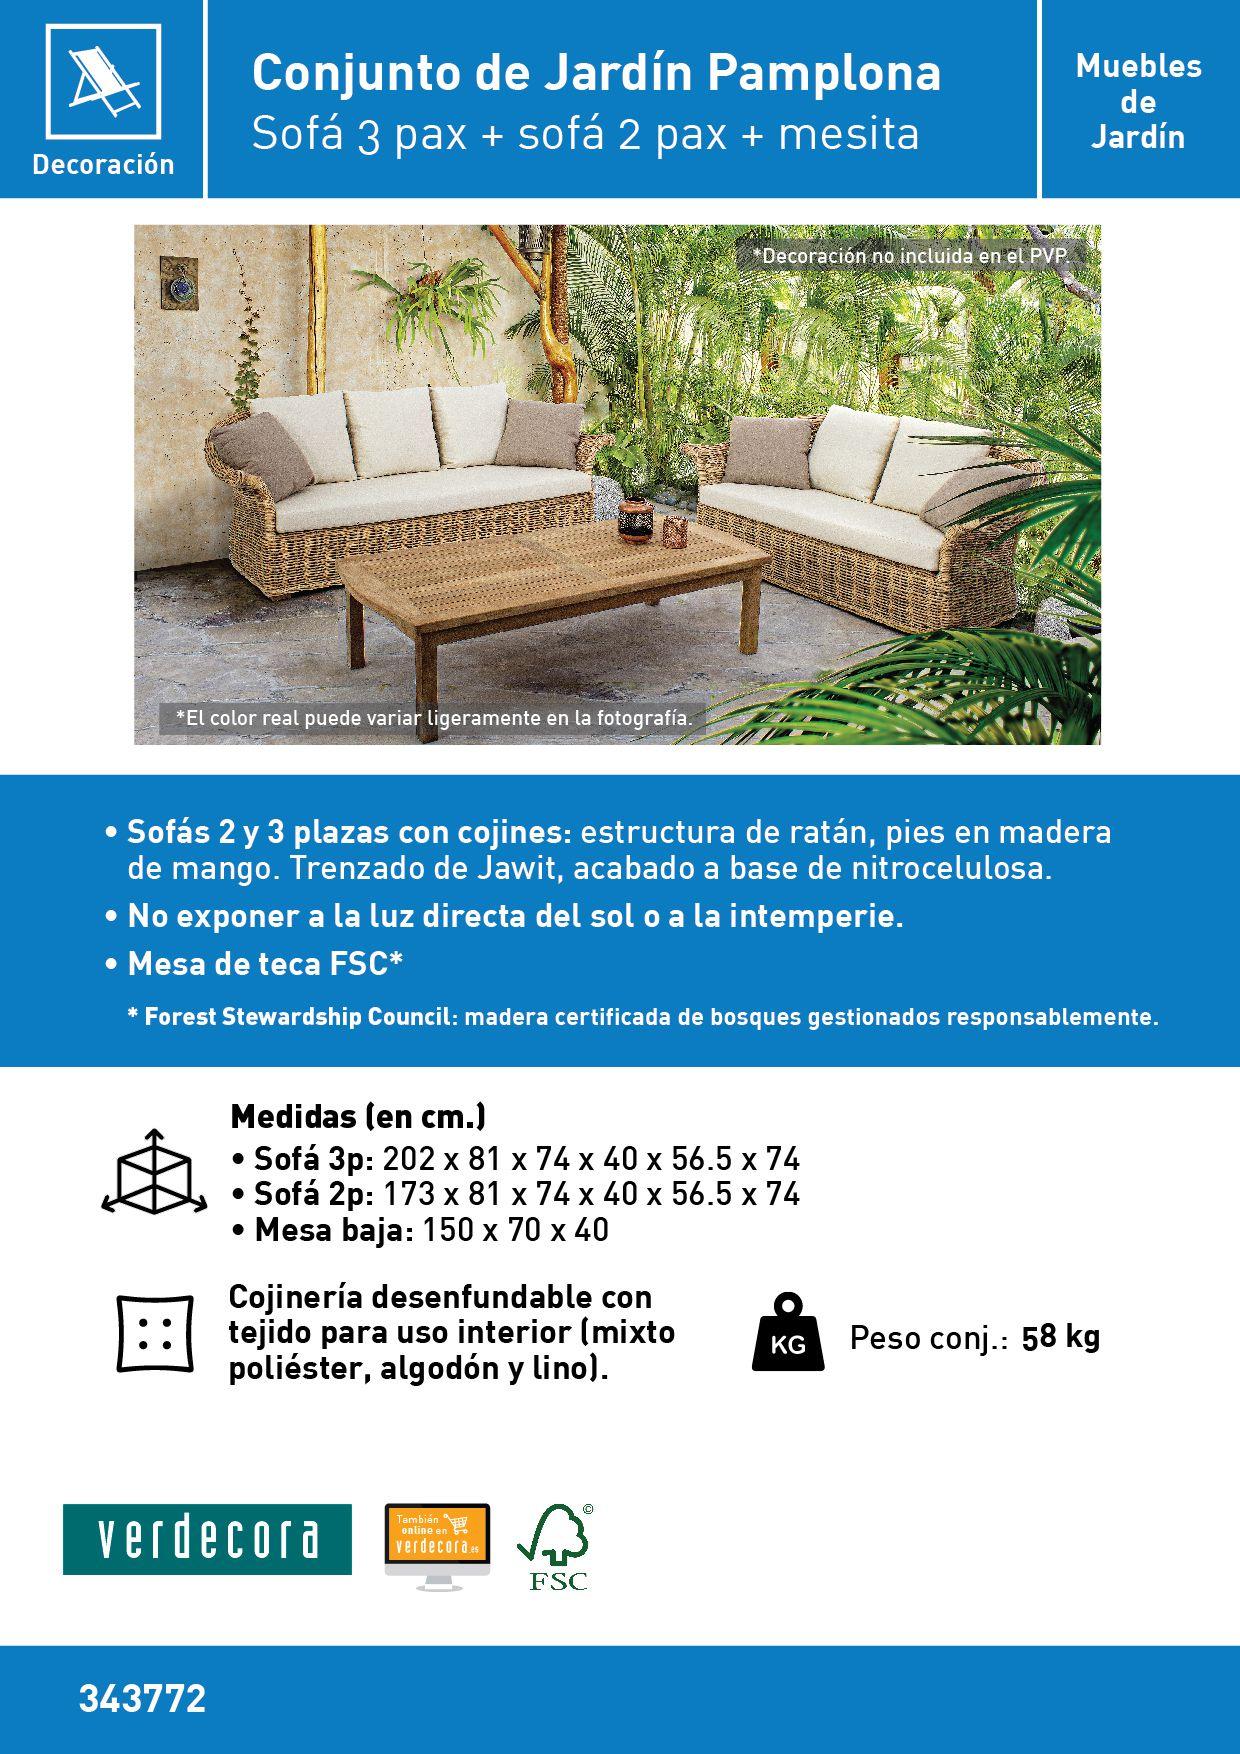 Mueble De Jard N Set Pamplona Verdecora # Muebles Riego De La Vega